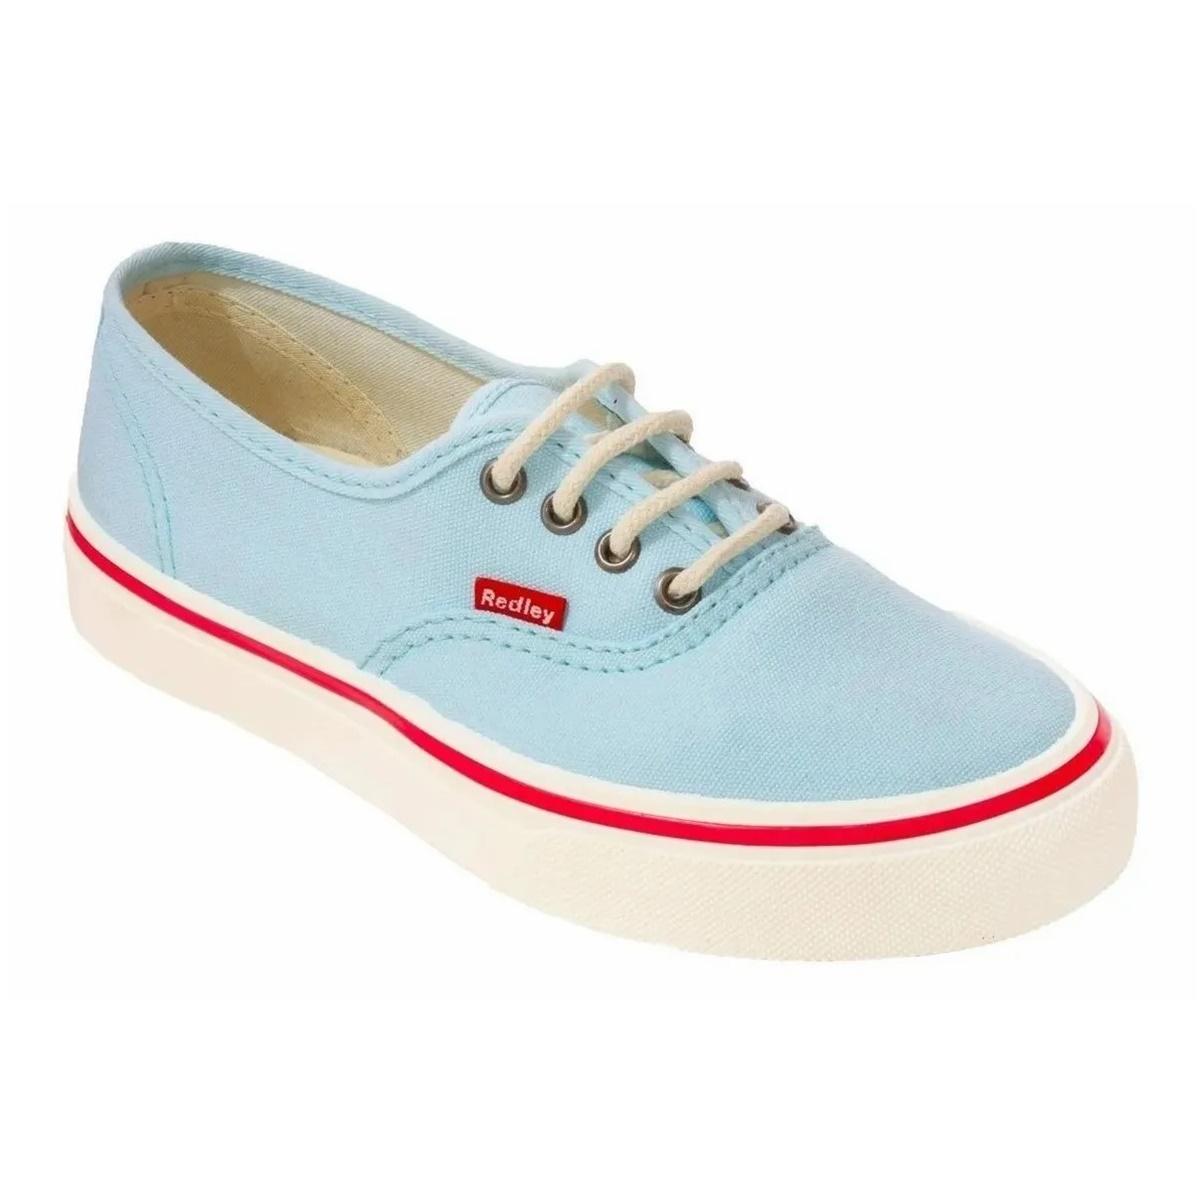 Tênis Unissex Redley Original Azul